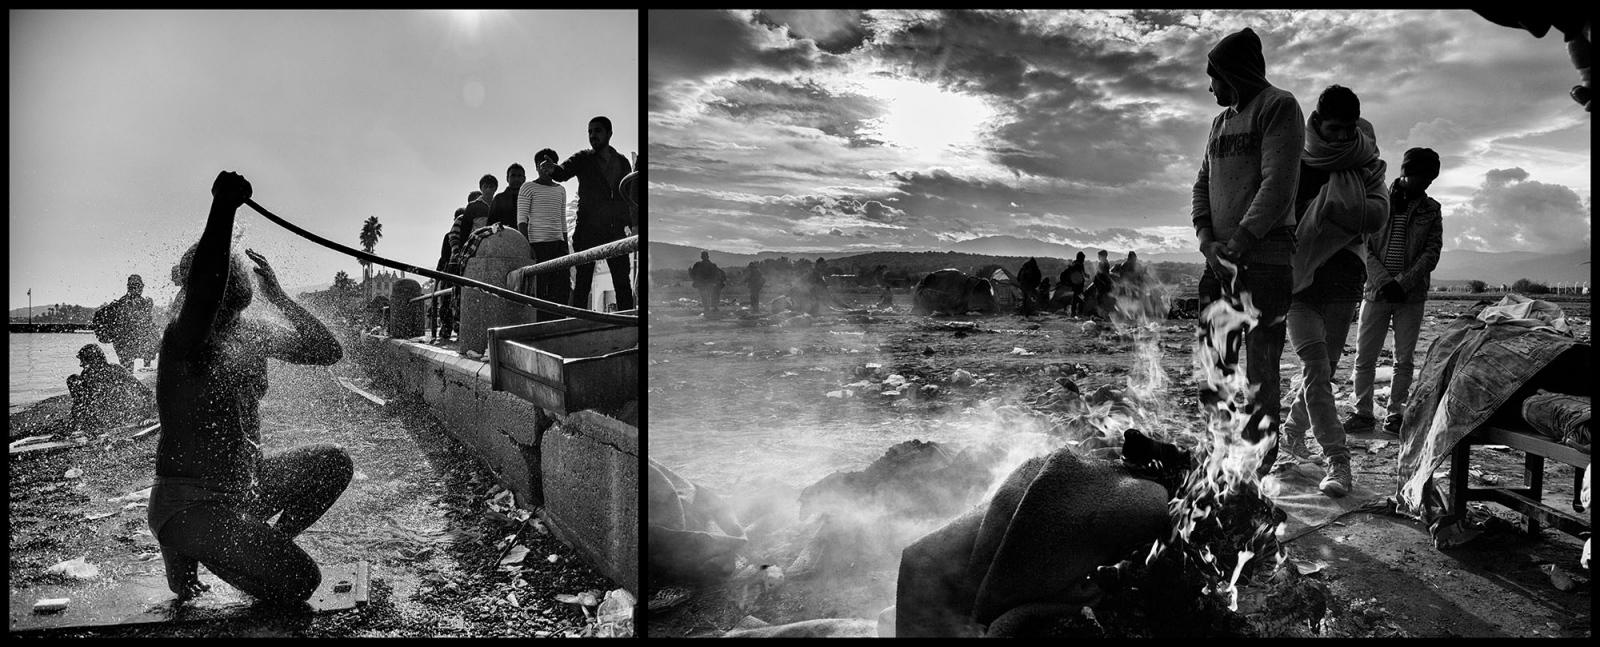 Art and Documentary Photography - Loading Nikos_Pilos_Stern_Goethe_institute_005.jpg